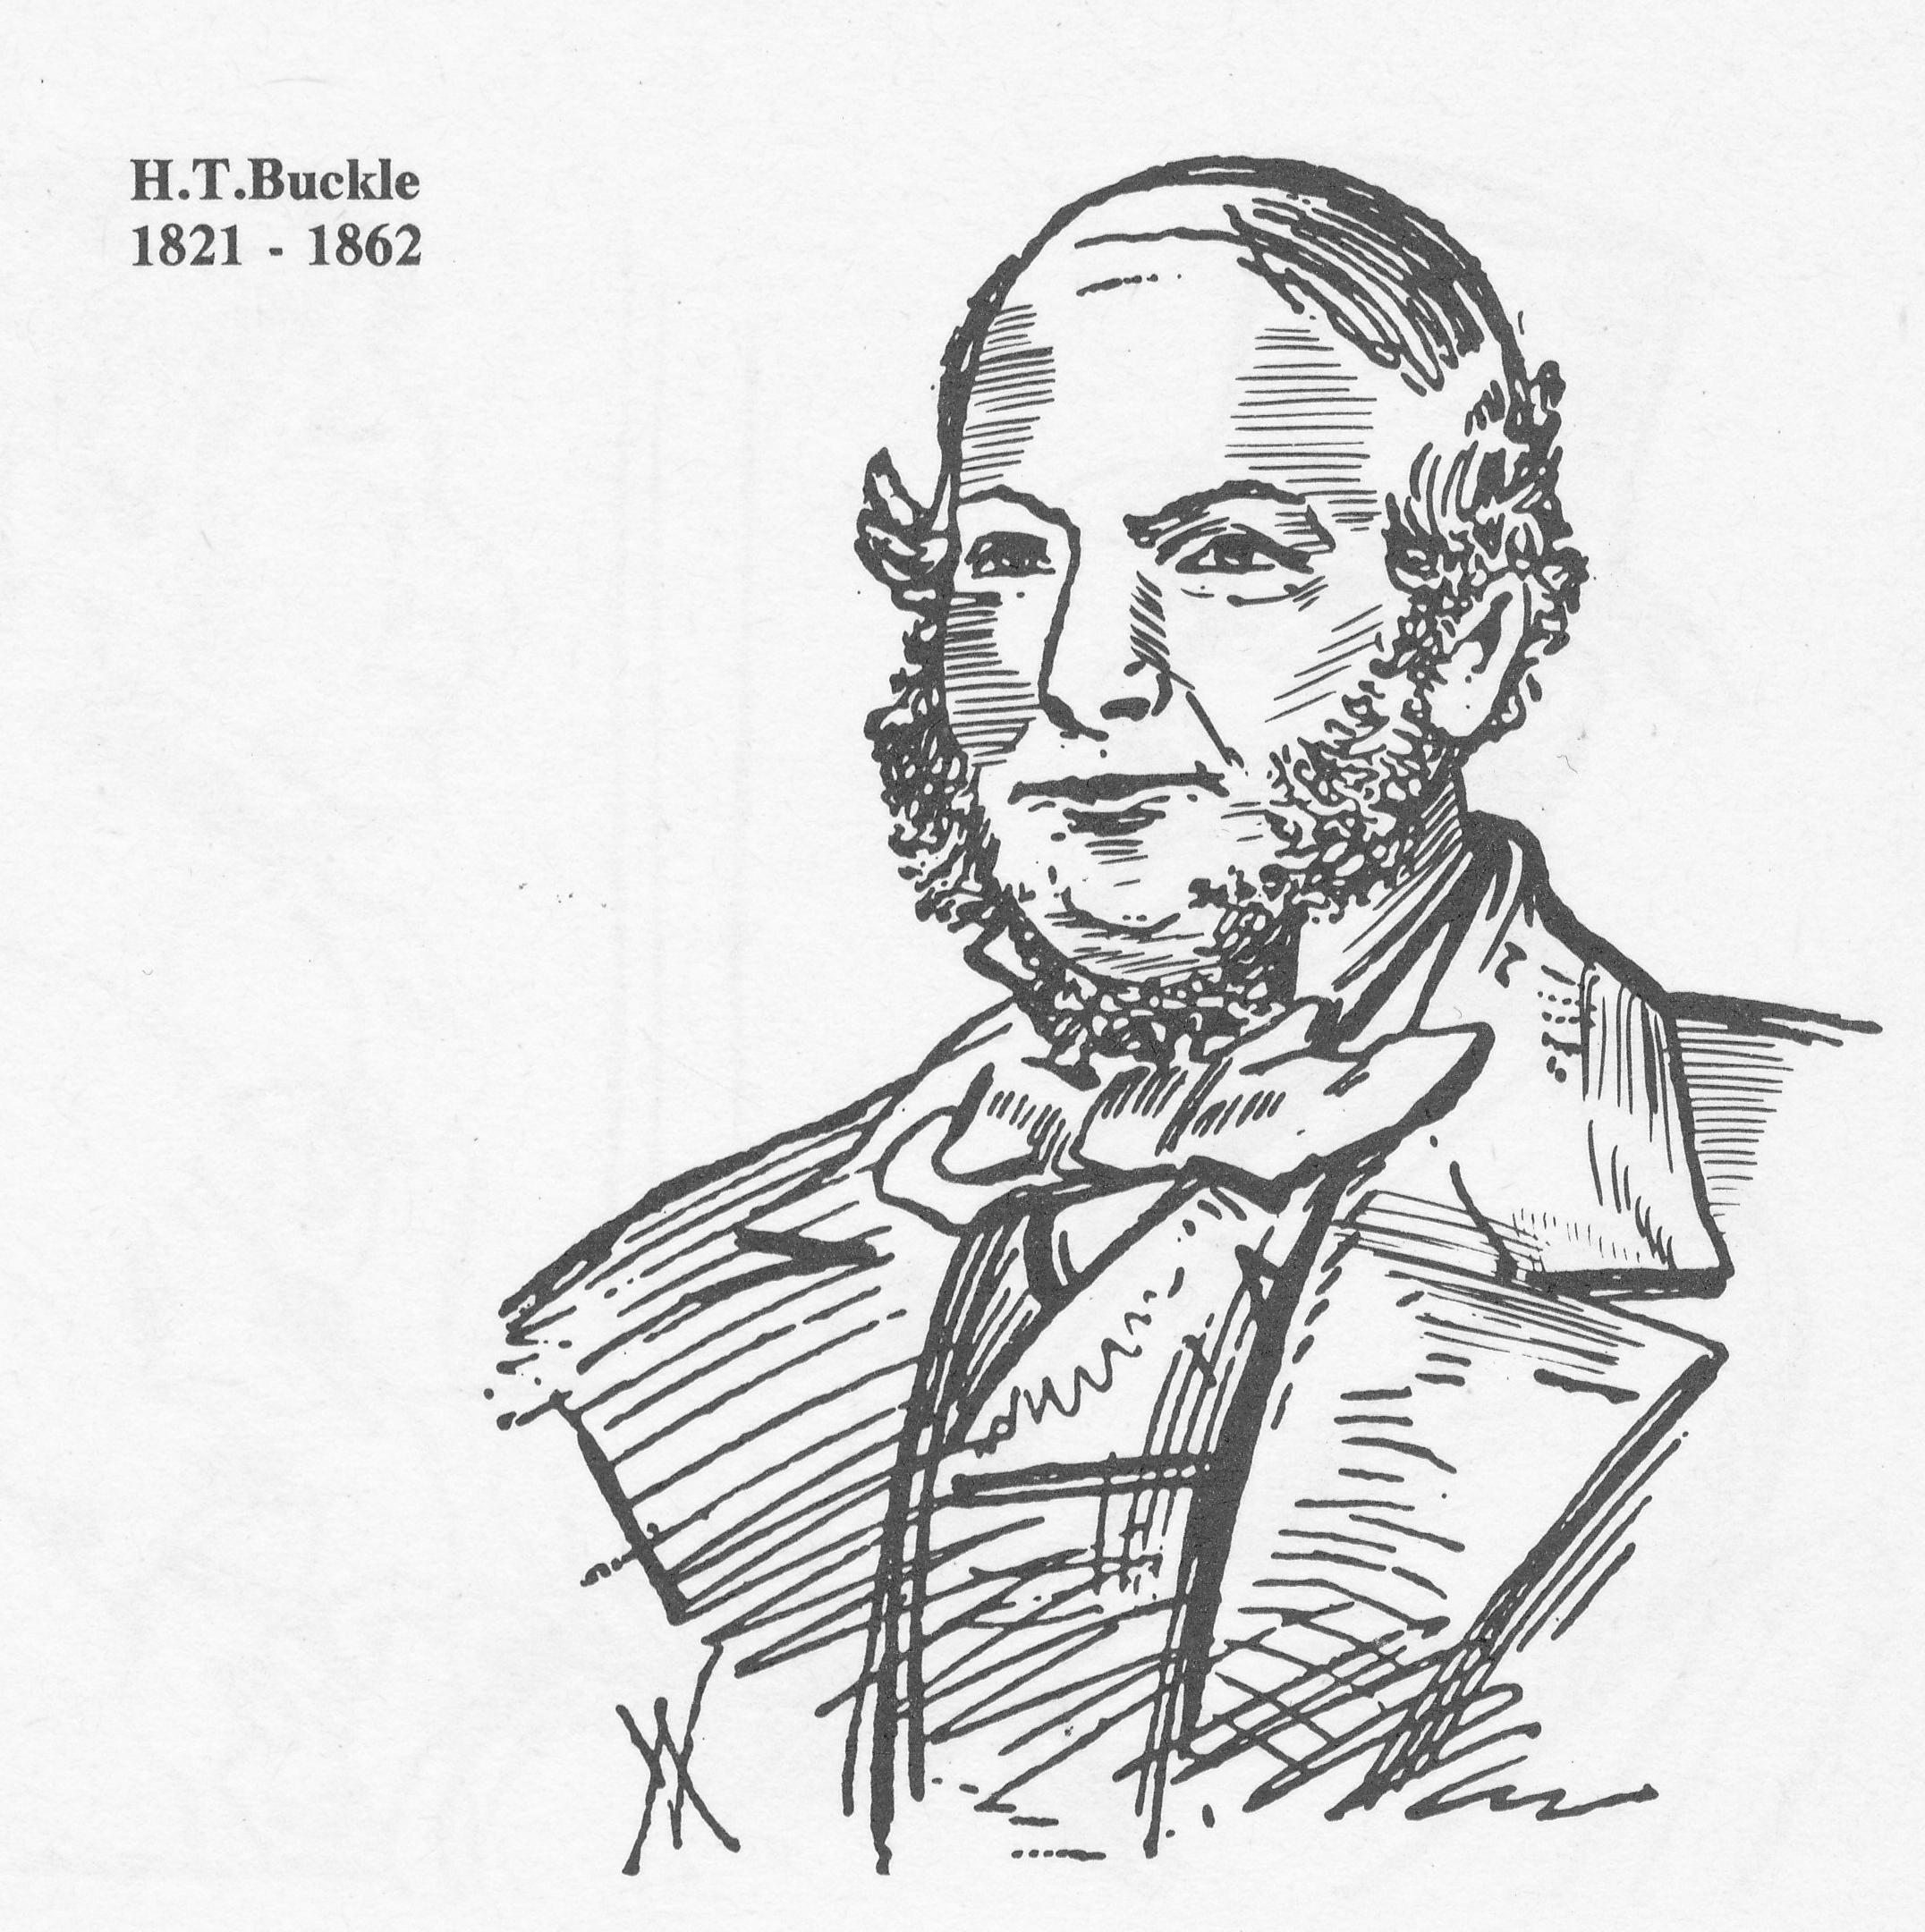 Henry Thomas Buckle (24-xi-1821 29-v-1862) from Howard Staunton, the English World Champion